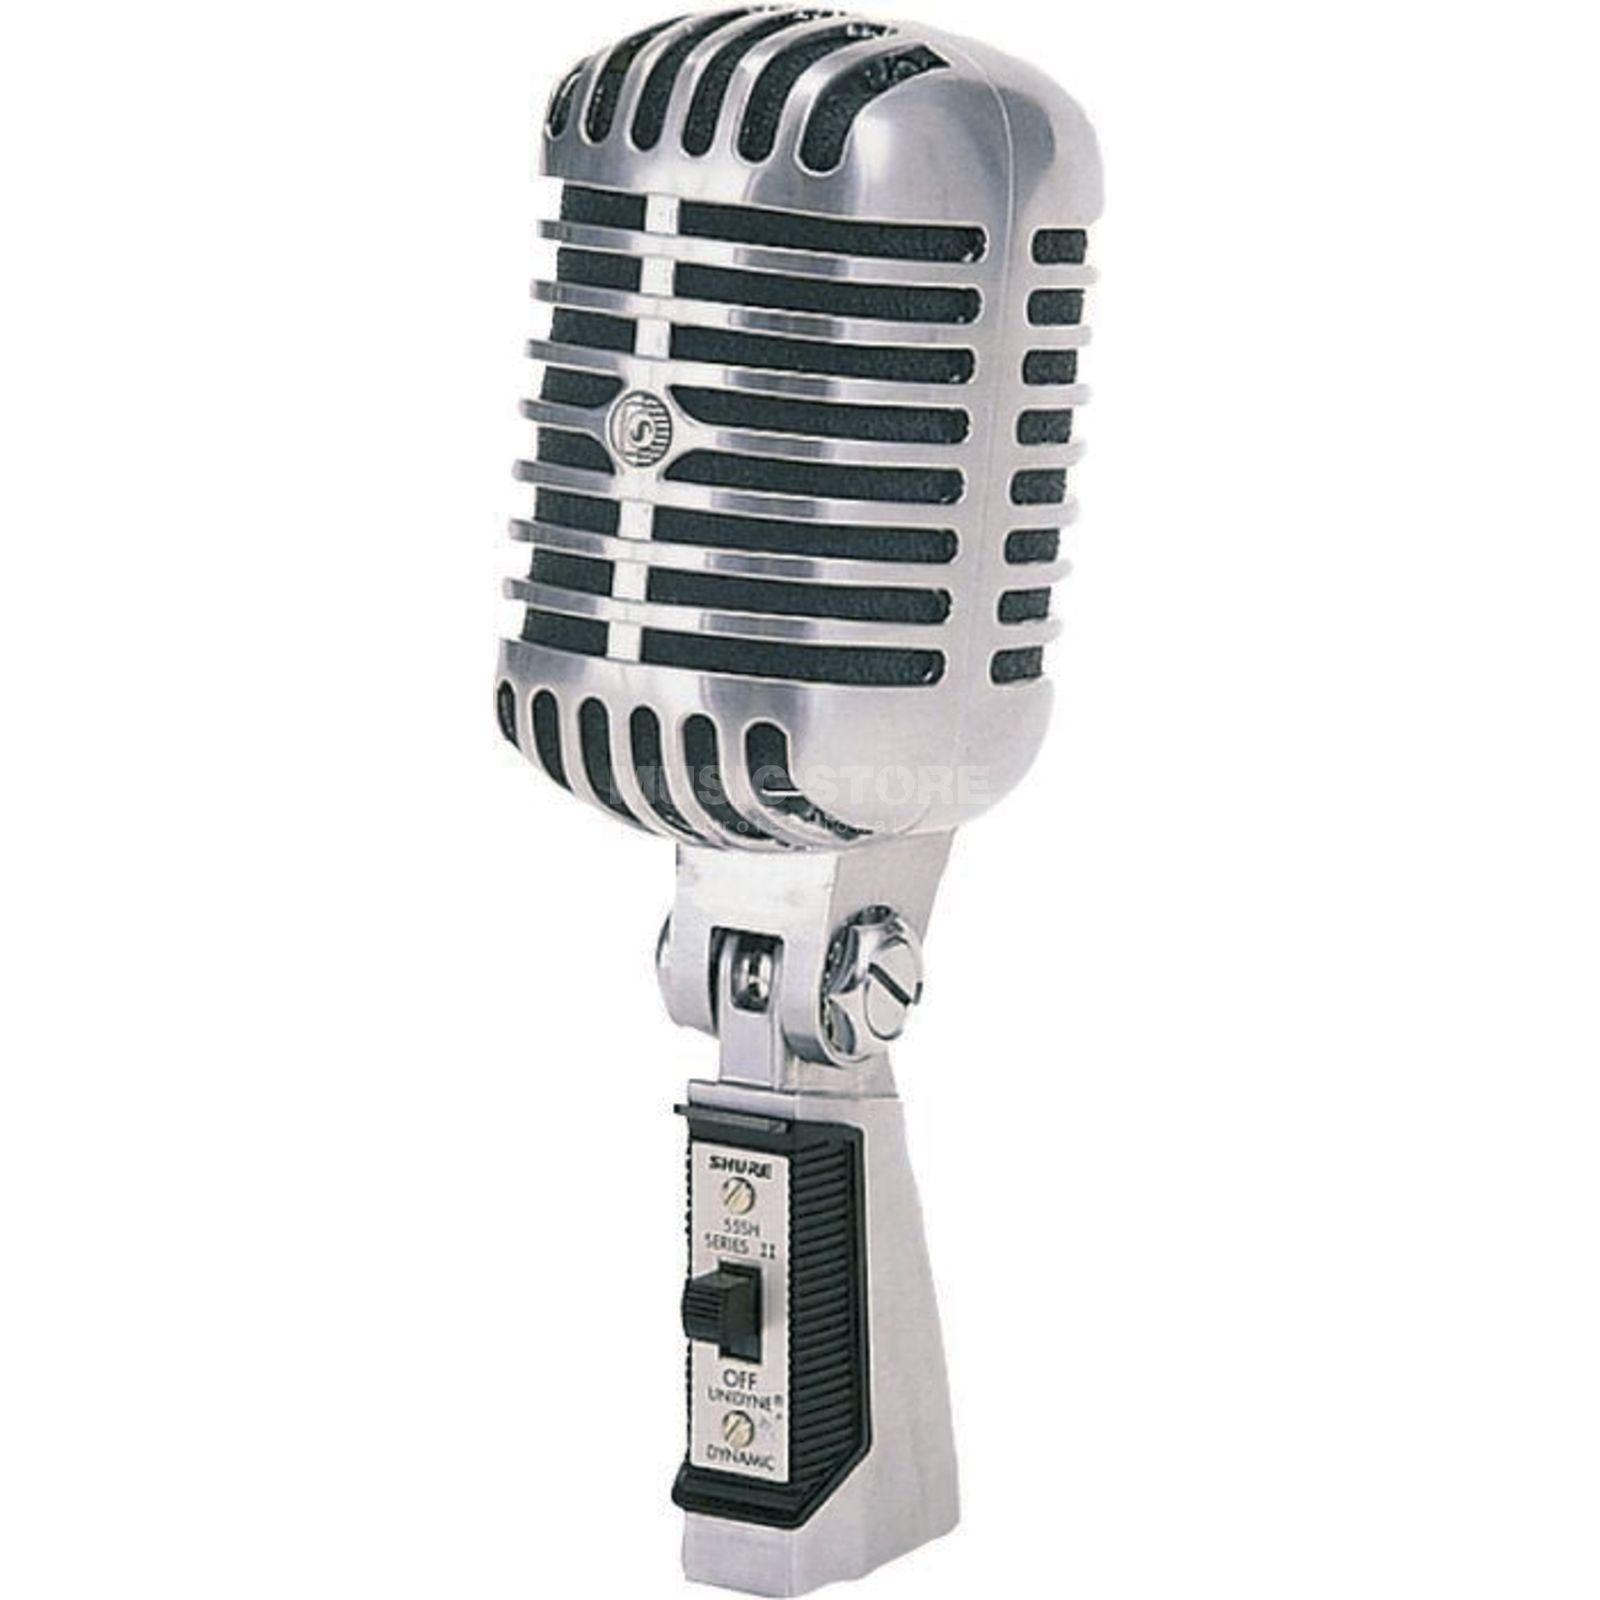 vintage shure 55? - Home Recording forums